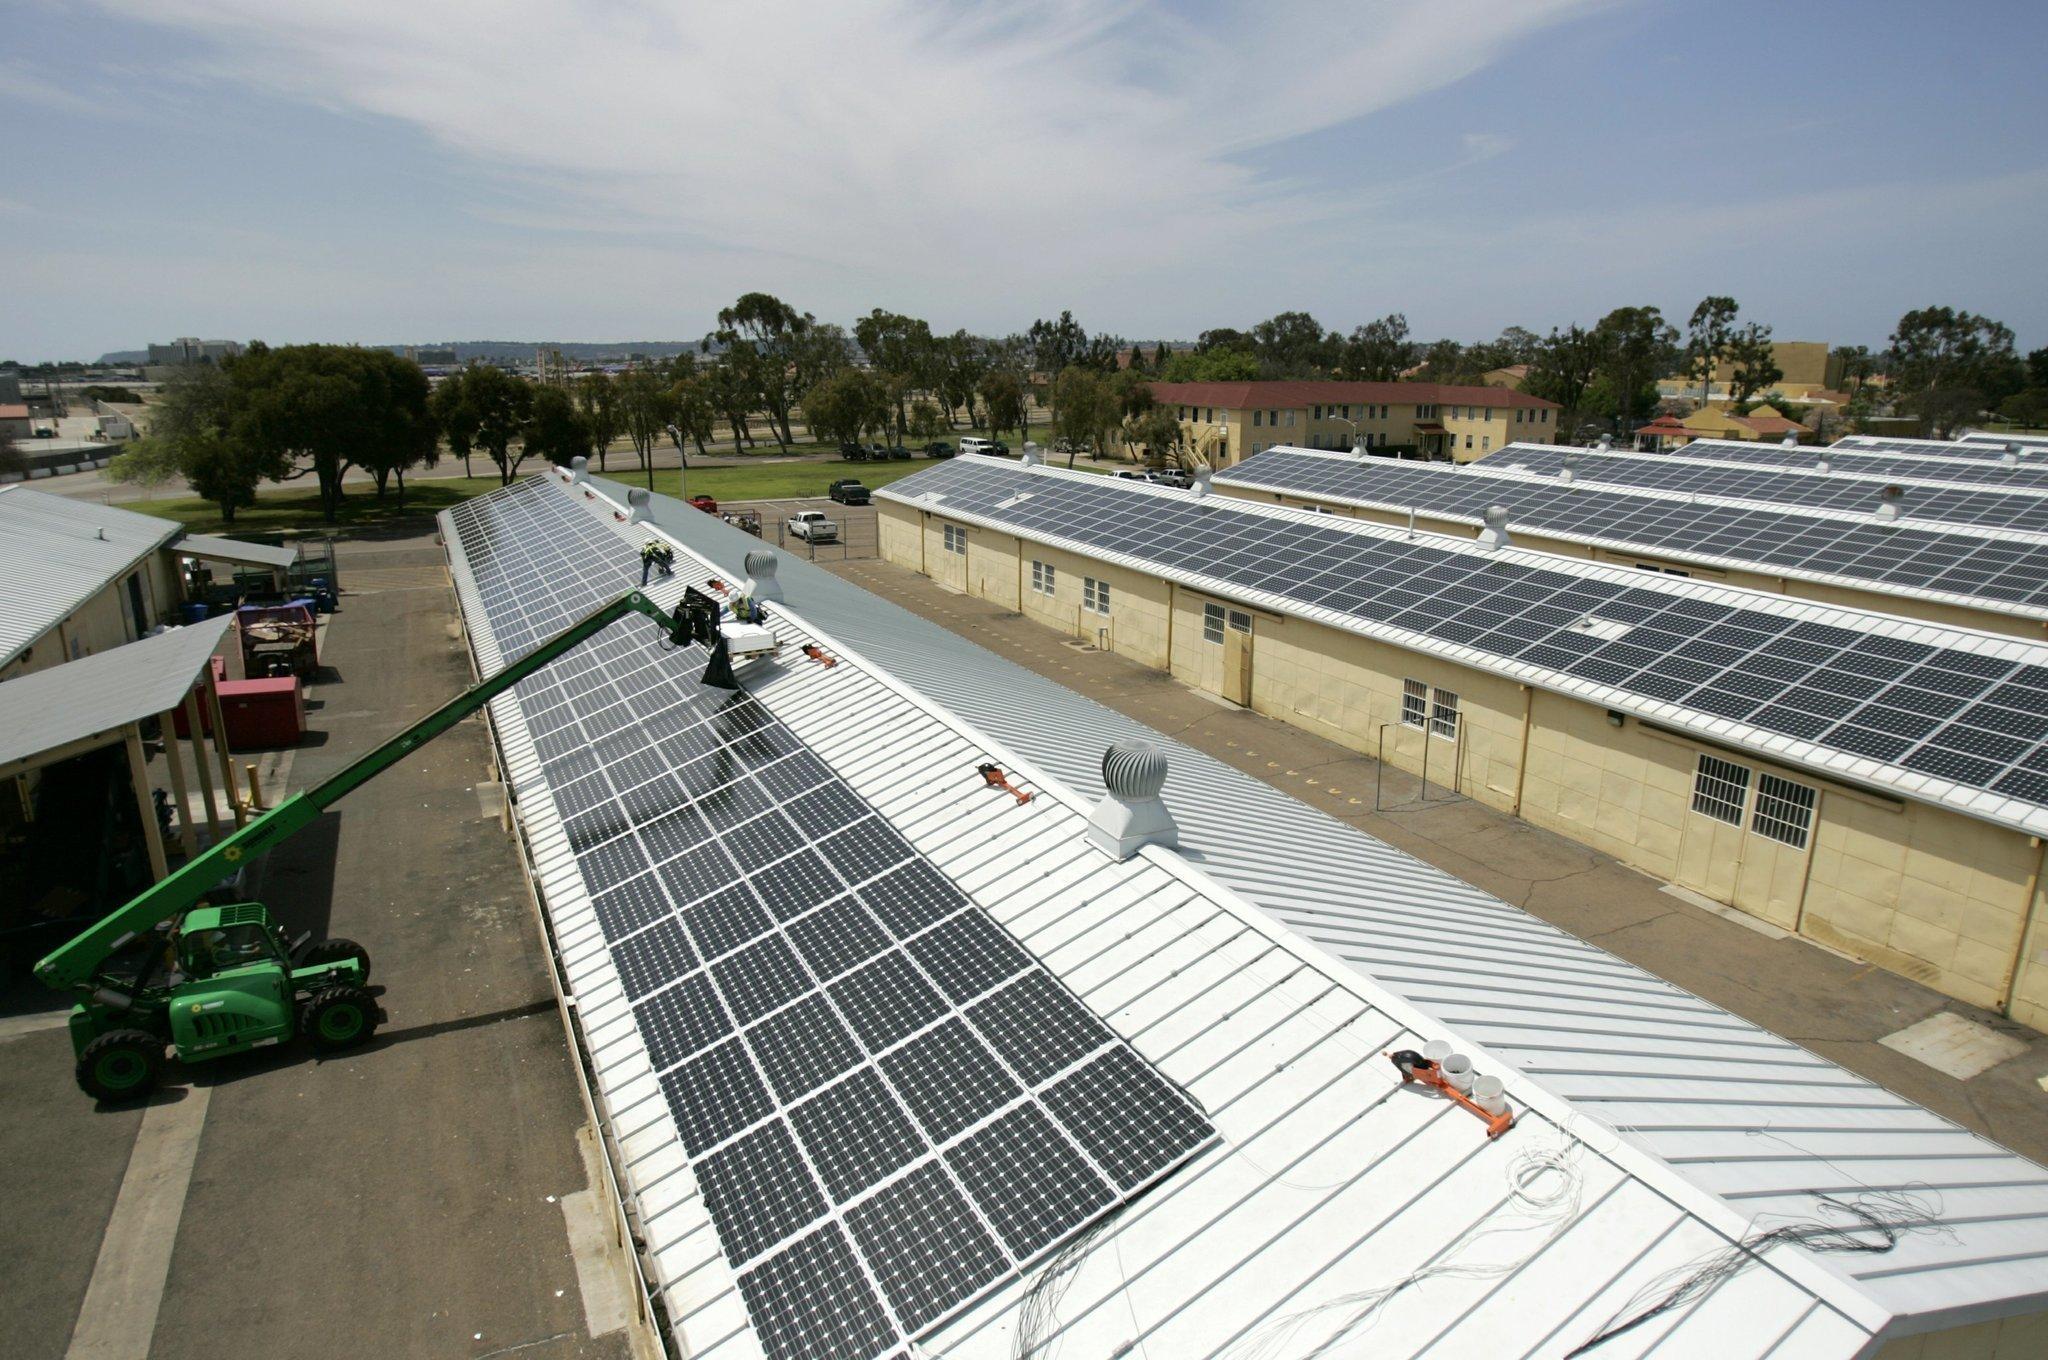 Camp Pendleton Goes Solar The San Diego Union Tribune